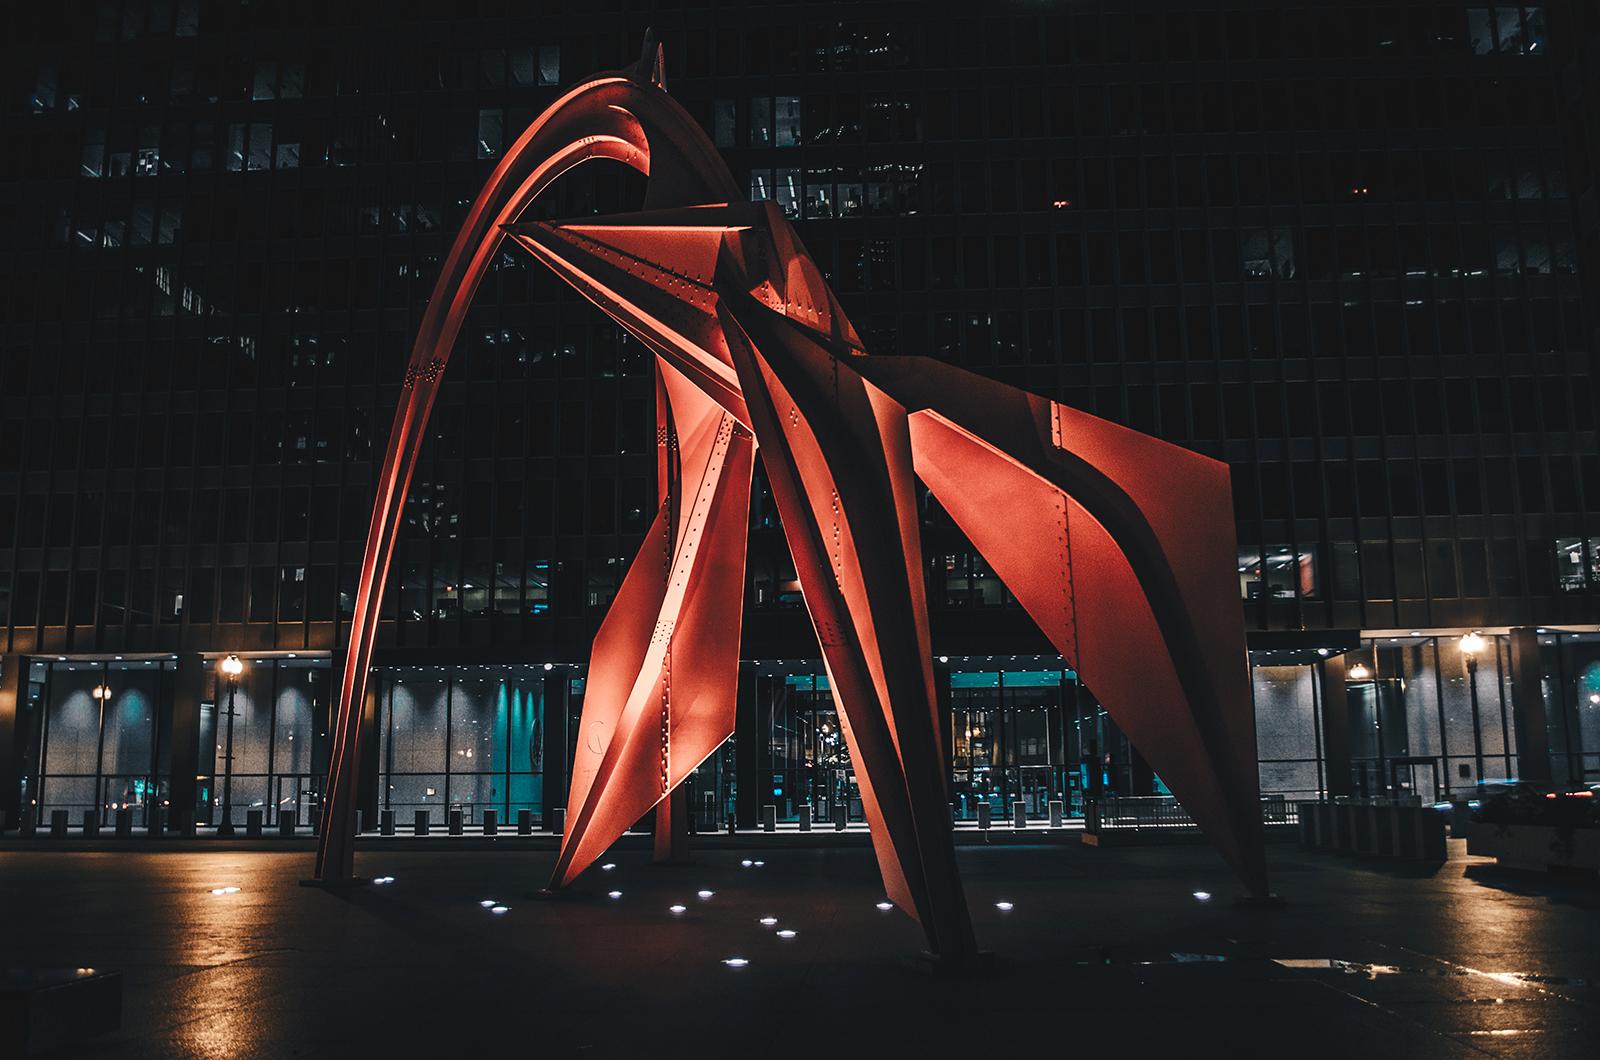 Calder's Flamingo located downtown Chicago.